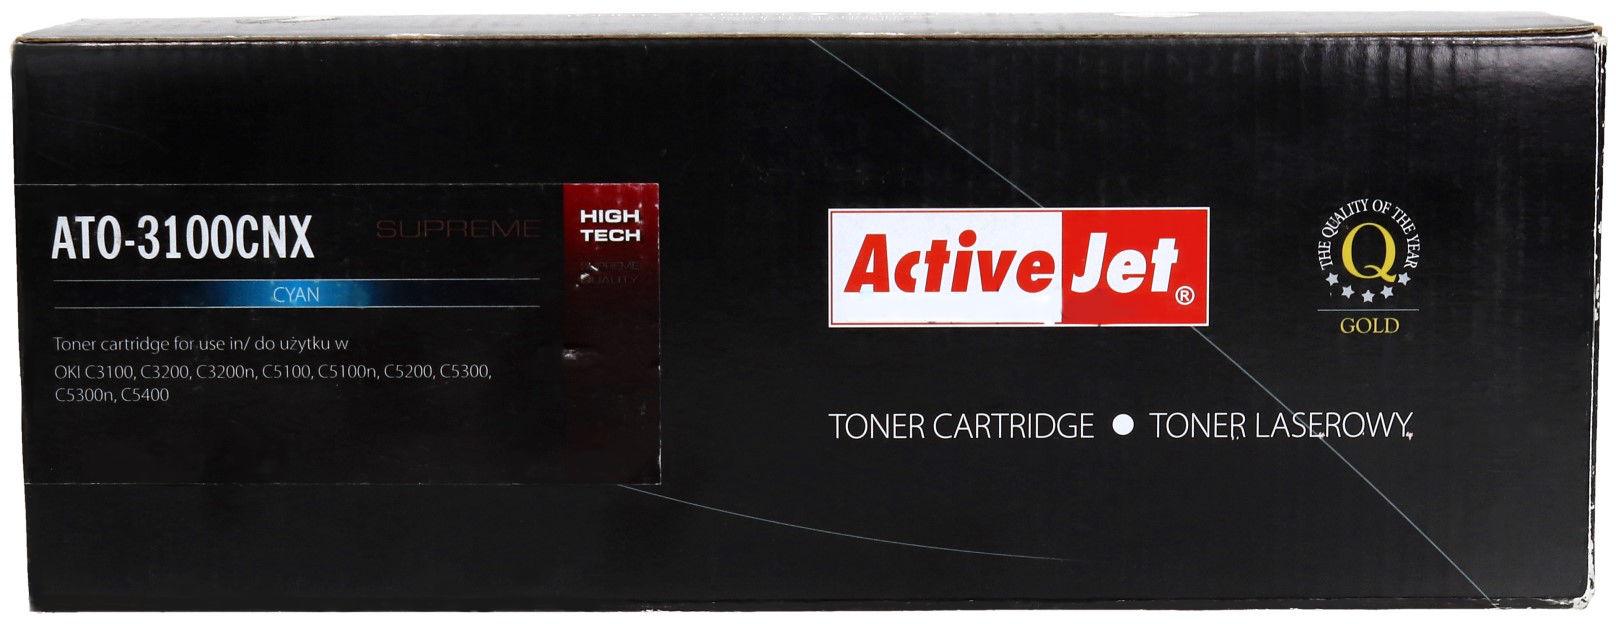 Toner Oki C3100/3200 cyan 5k ActiveJet ATO-3100CNX